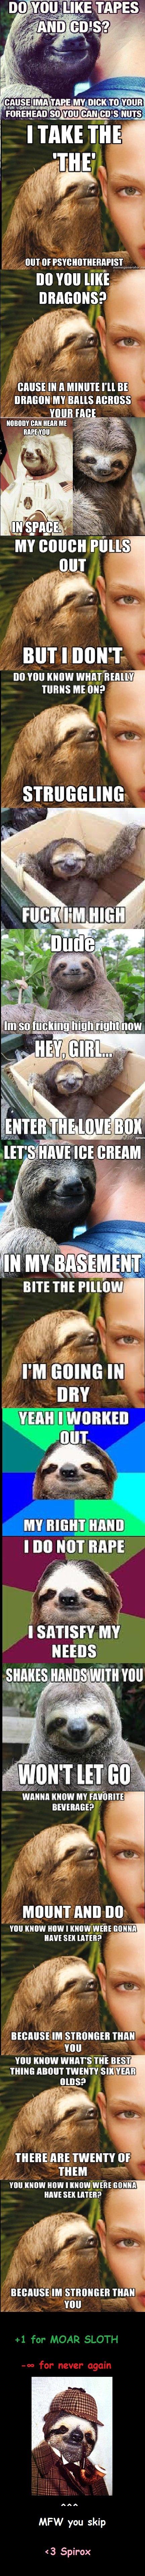 Sloth Comp. tons of slothy goodness. Ink: tlg? Jis, 69: 52 BO VIII] LIKE . CHINISE III ll MINUTE I' ll BE MY RAILS MASS MIR HI I if I I In i Grmmar.', mans HIE